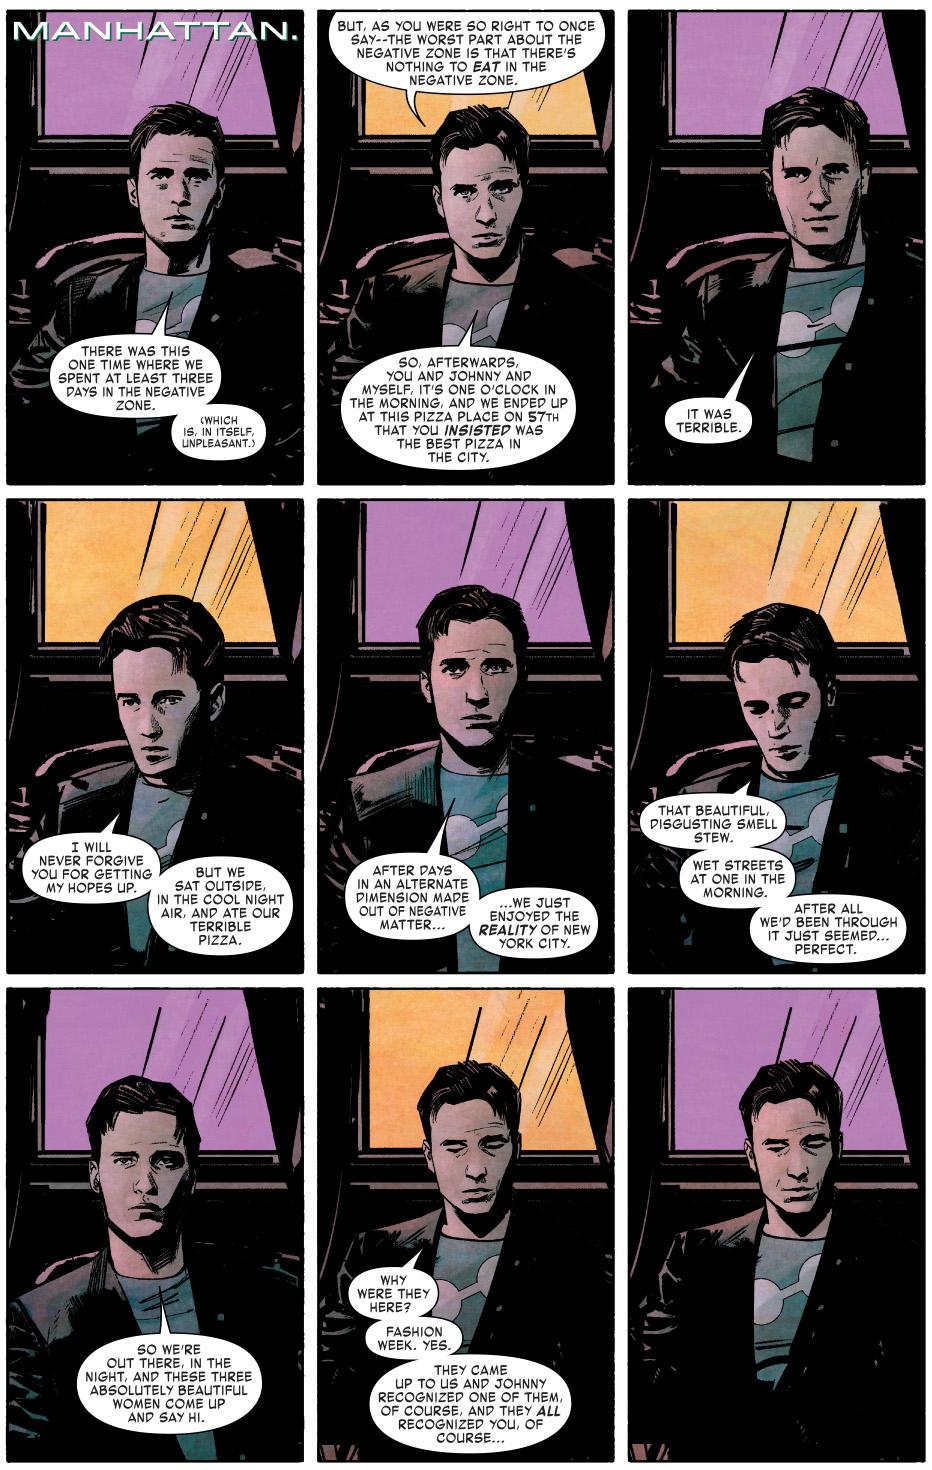 abdd55be828 Mister Fantastic Wants Victor Von Doom Dead | Comicnewbies